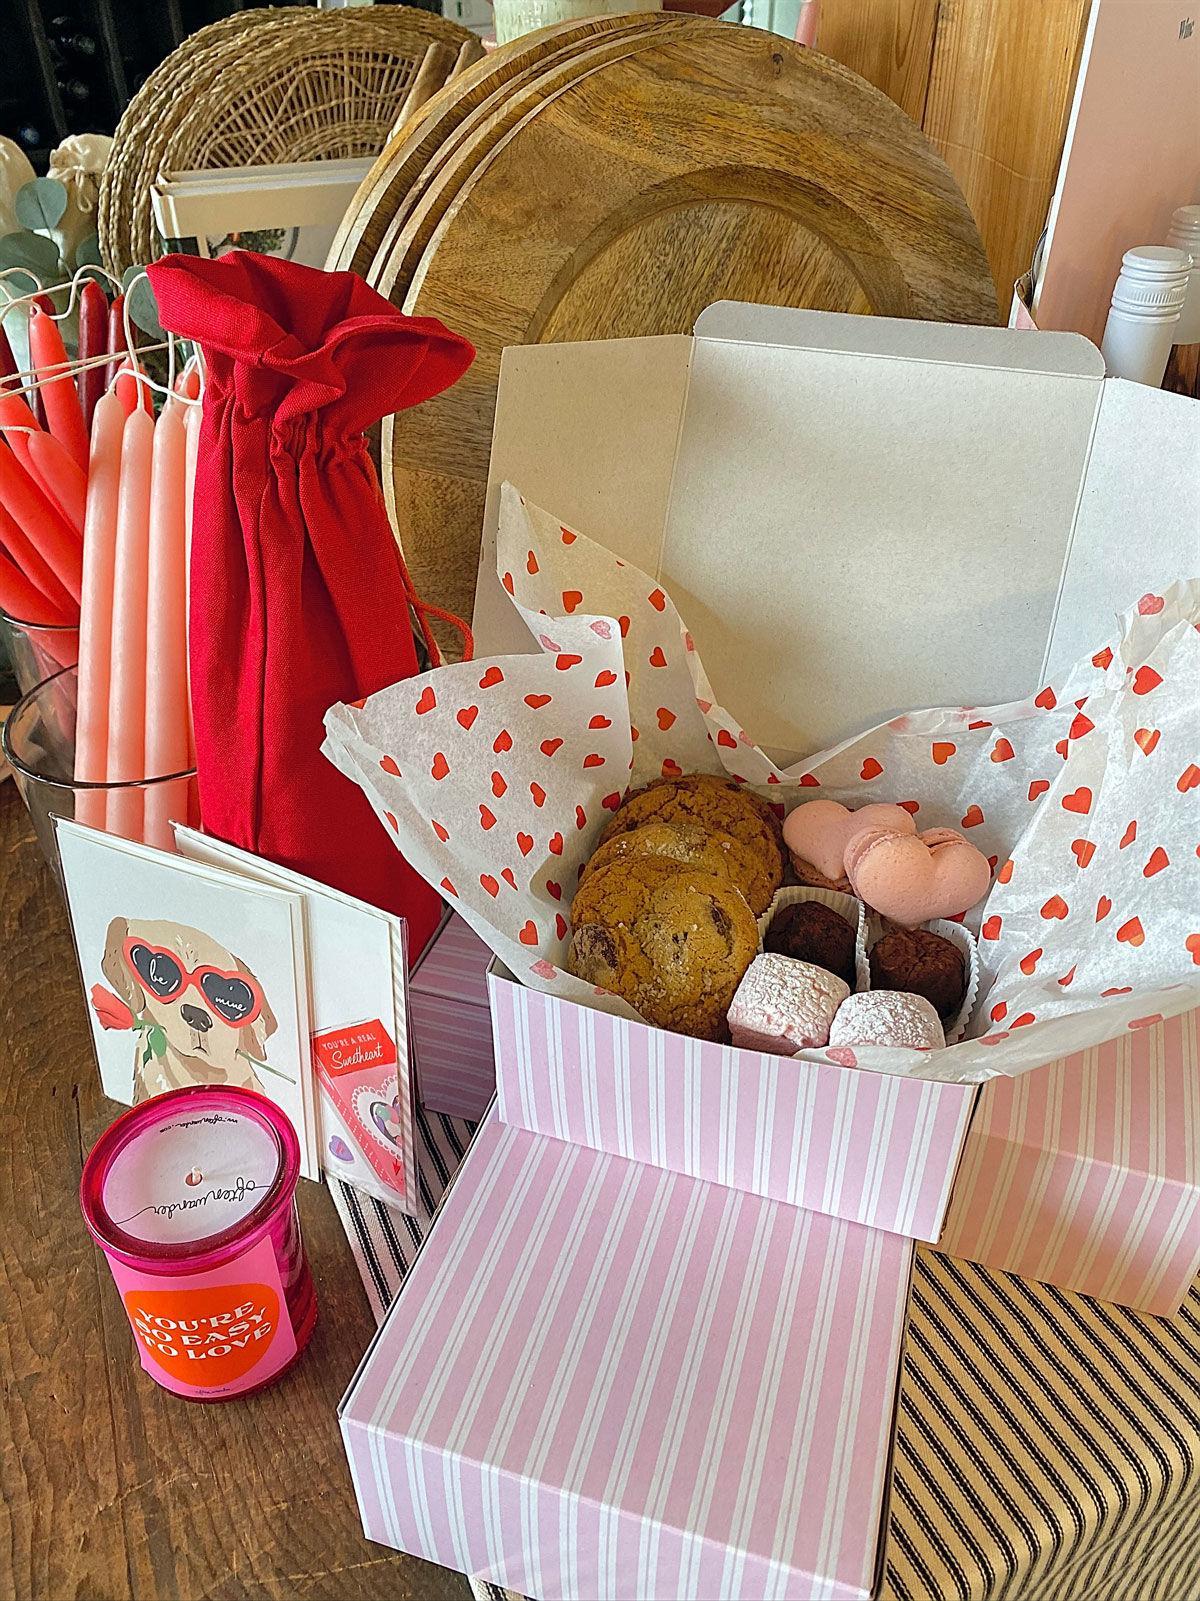 16 Ways to Celebrate Valentine's Day - H&E